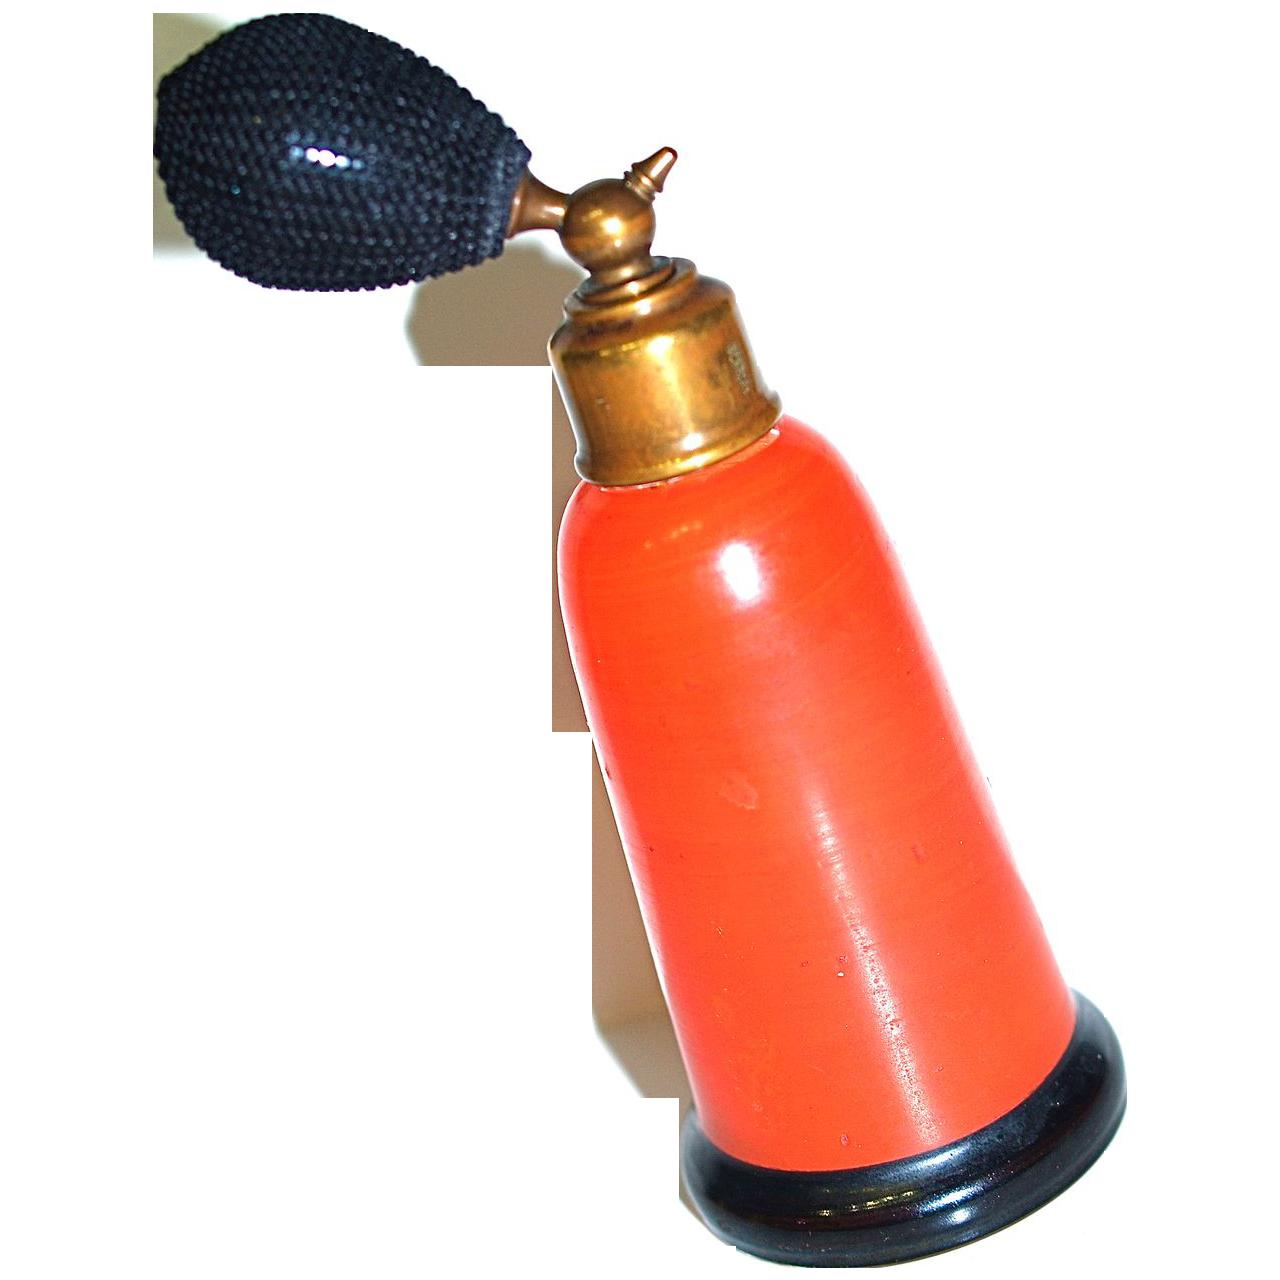 Tango Orange Czech Perfume Atomizer